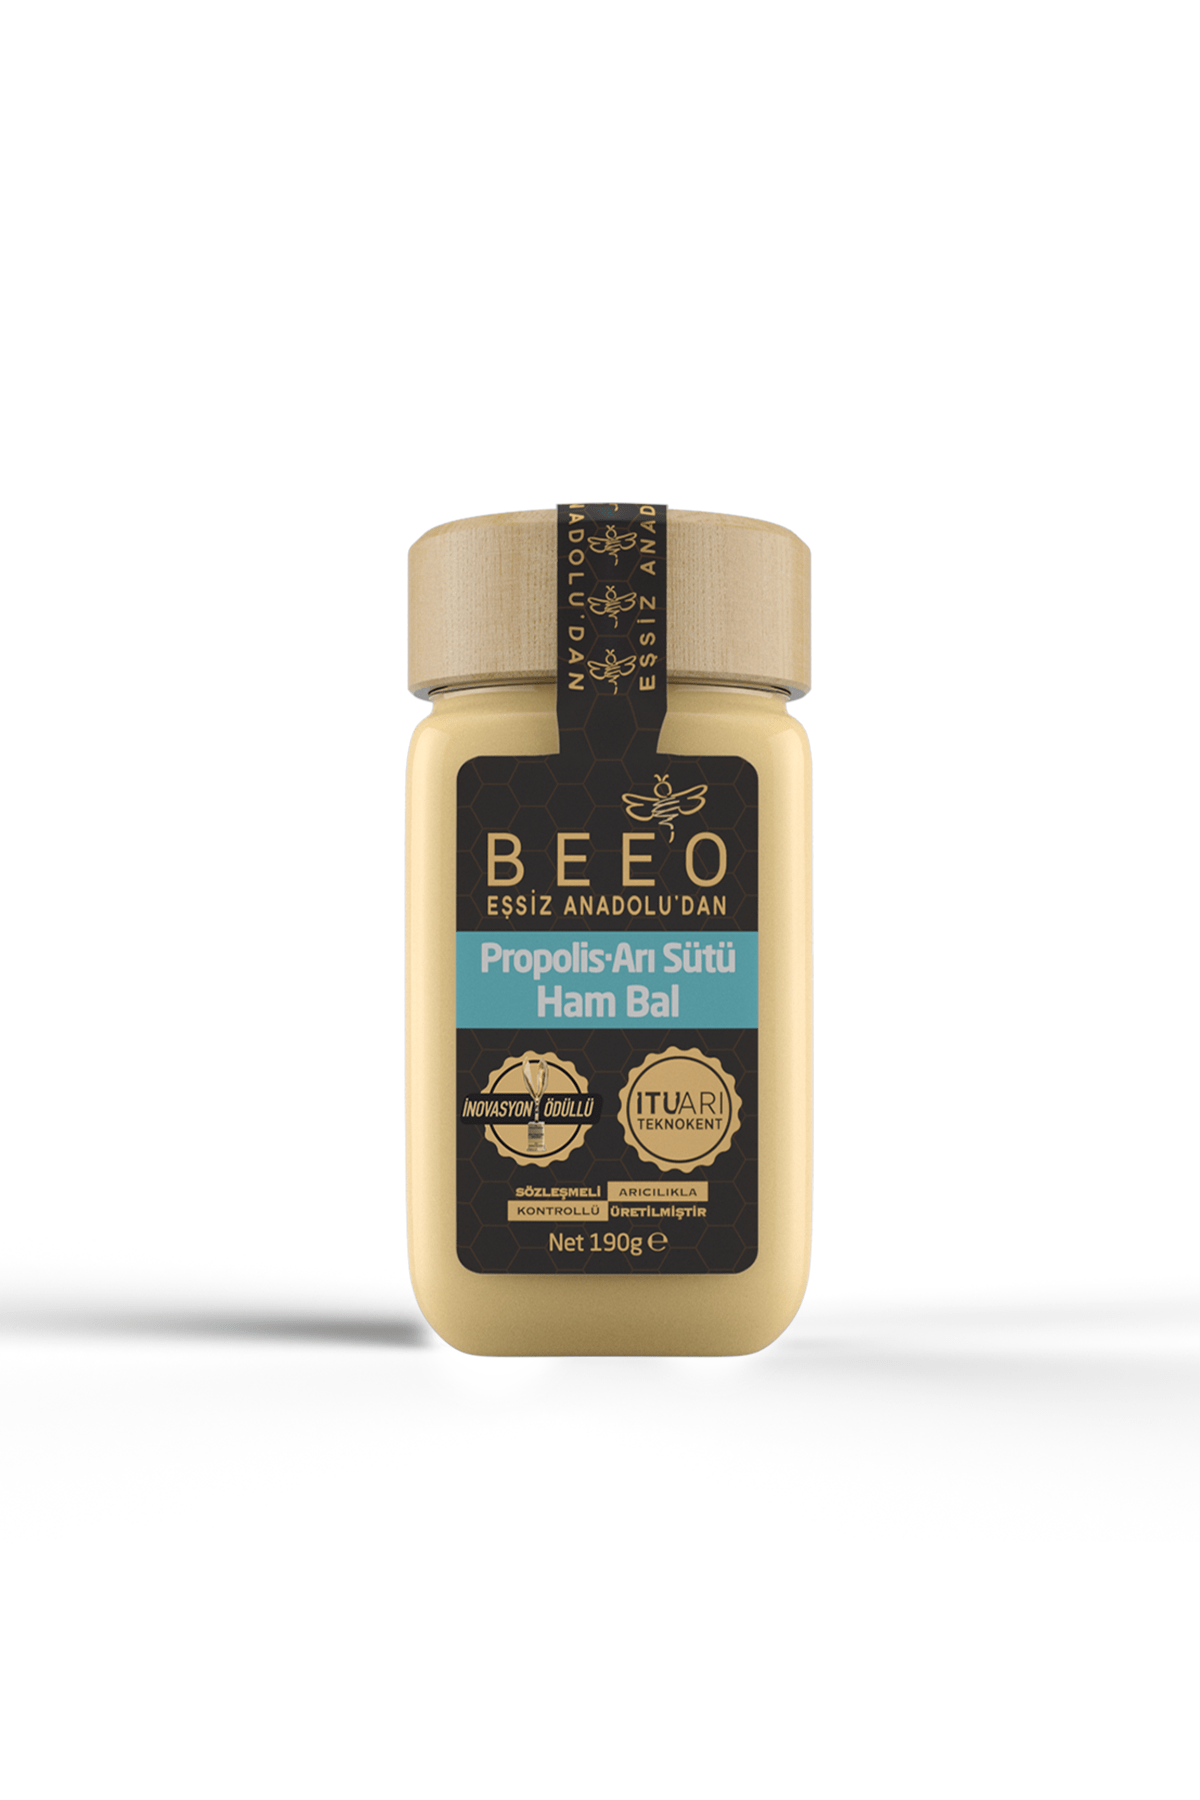 Beeo Propolis - Arı Sütü - Ham Bal 190 G (yetişkin) 0